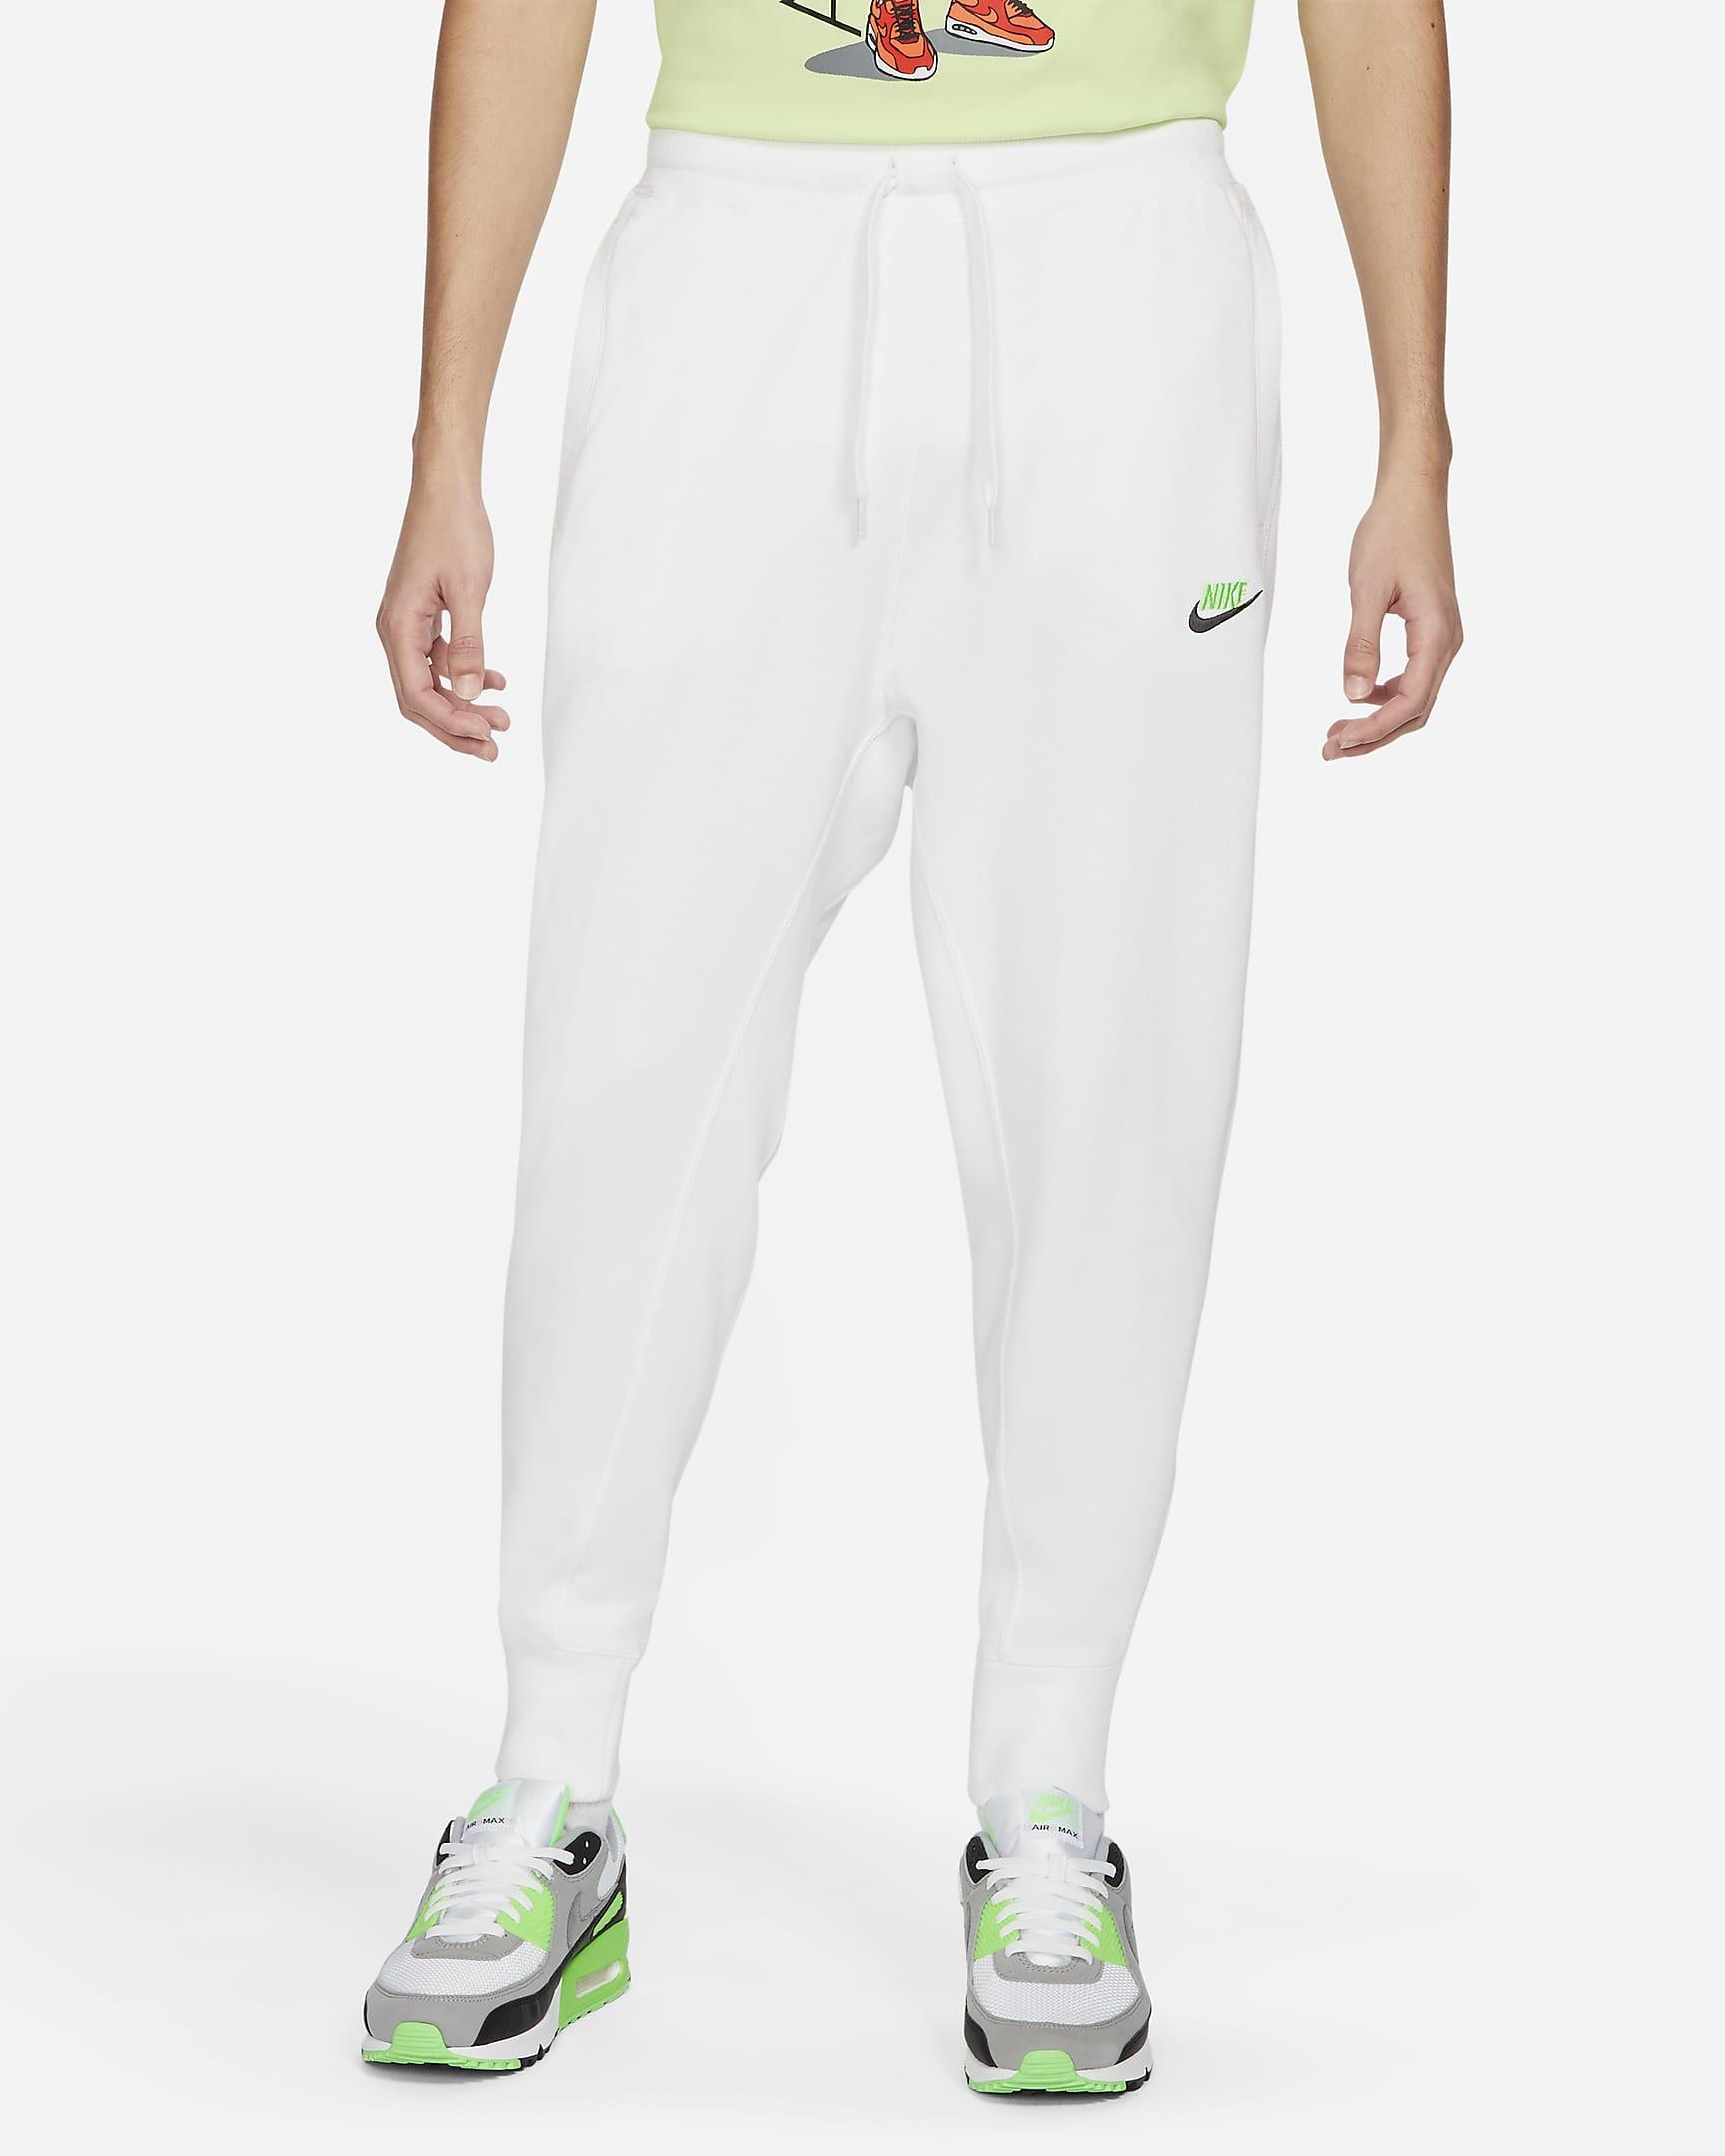 sportswear-mens-french-terry-pants-DgDCHh